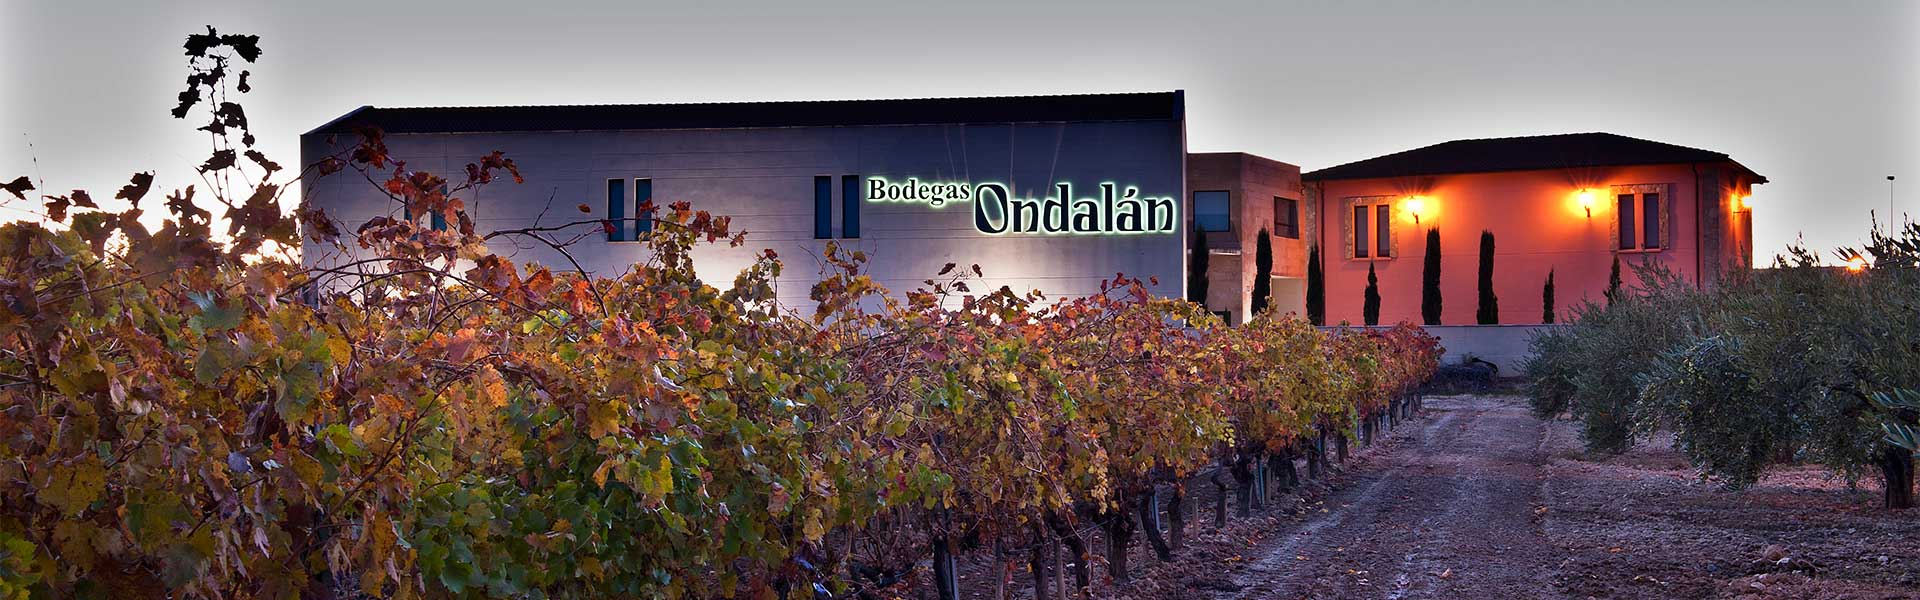 Bodegas Ondalán. Bodega y viñedo de Rioja Alavesa